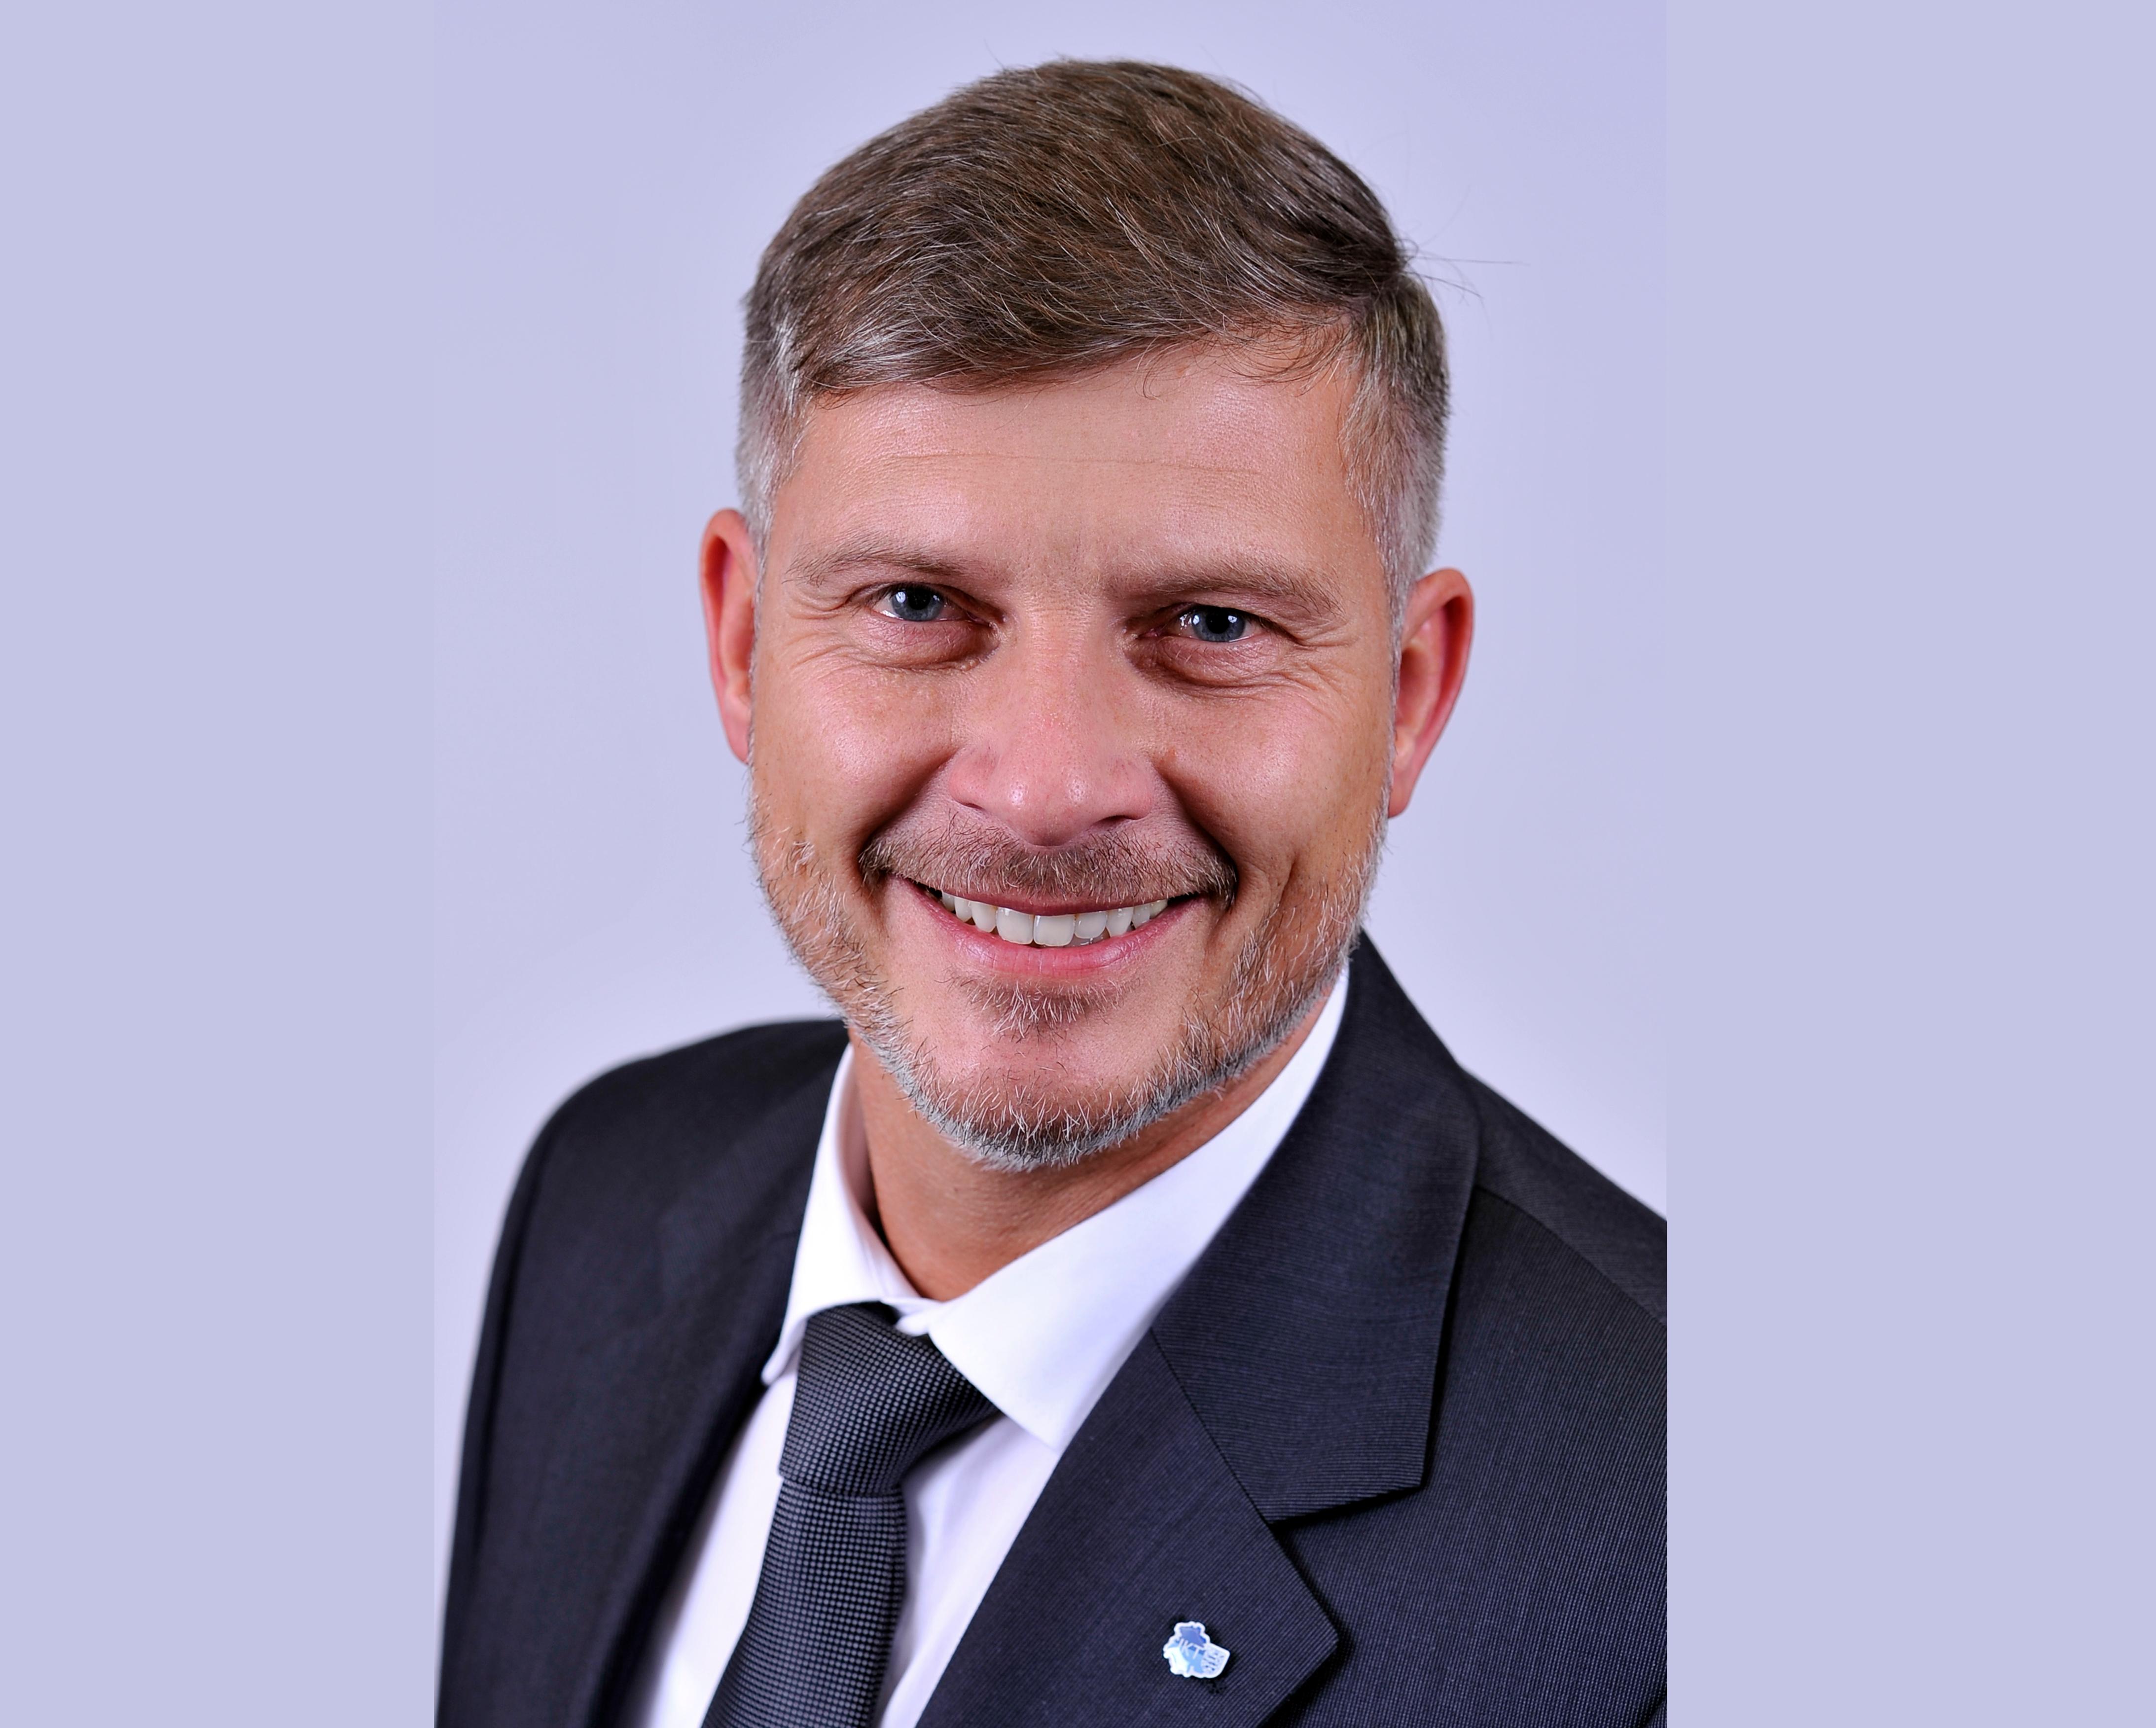 Dr. Rici P. Löbig, Ingenieurkammer Thüringen